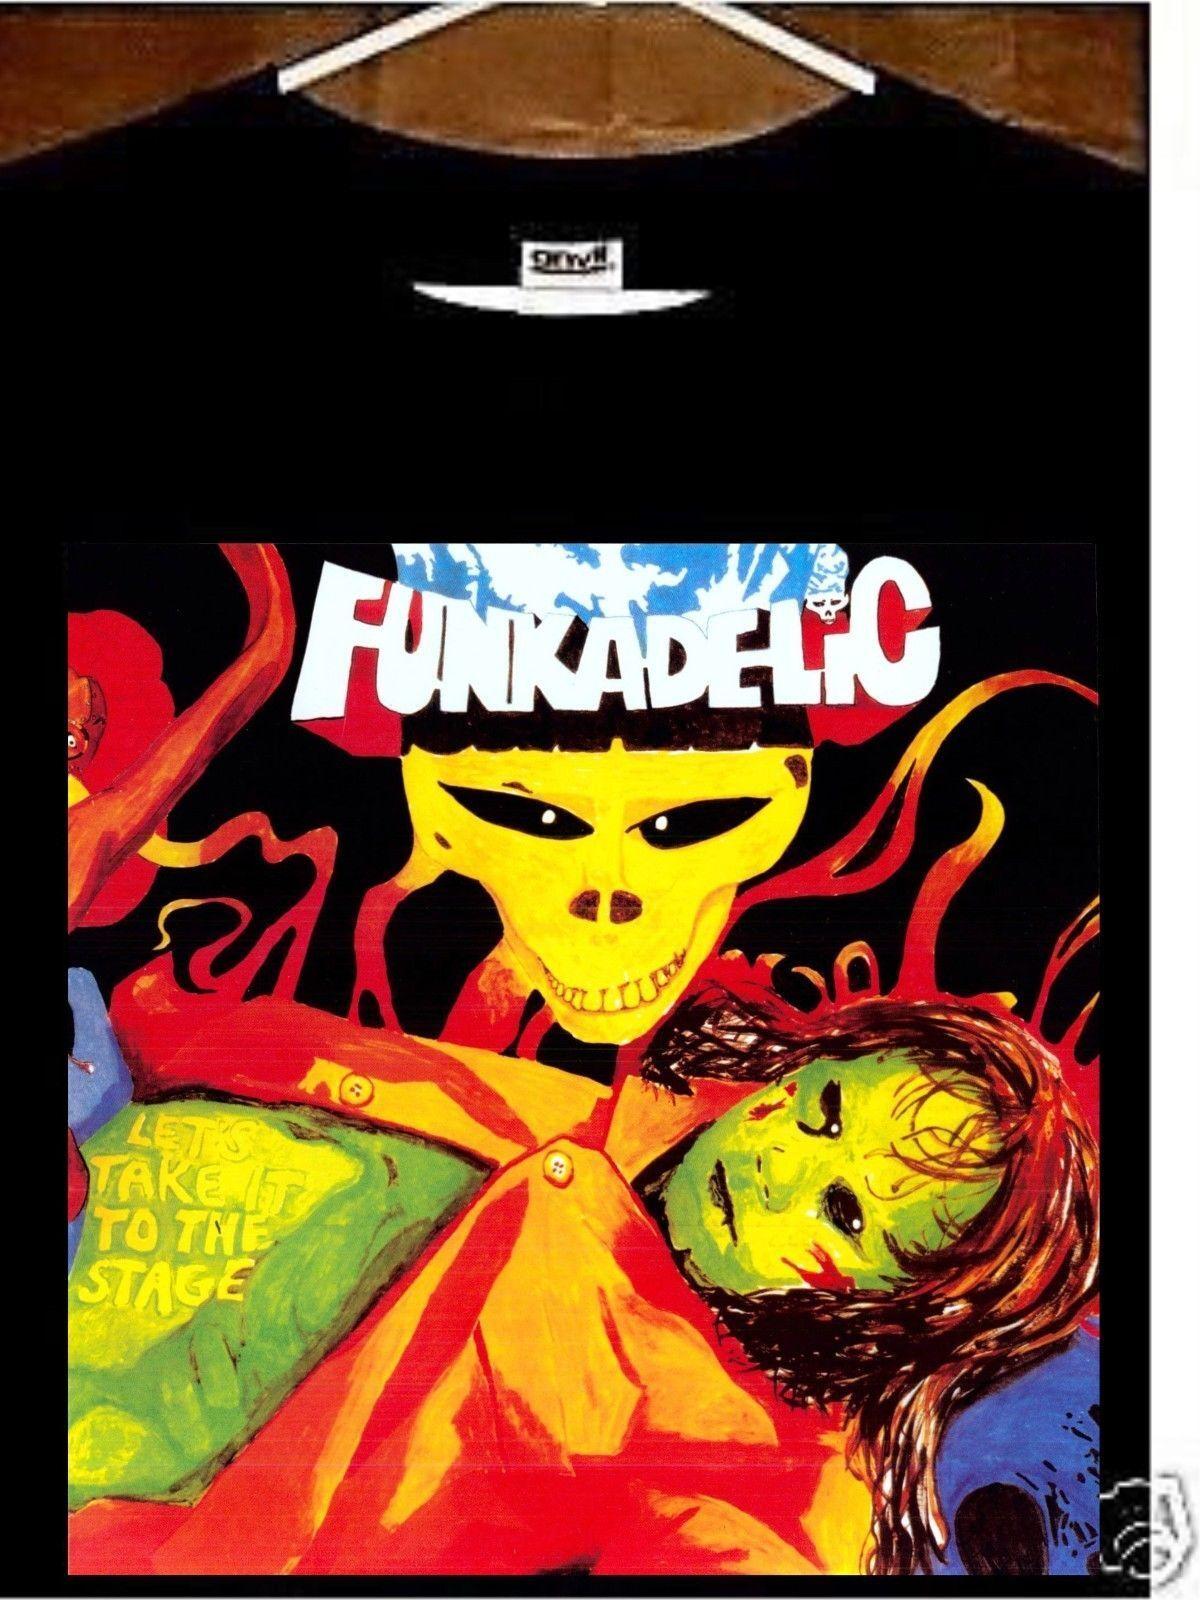 Funkadelic T shirt; Funkadelic Lets Take It To The Stage Tee shirt